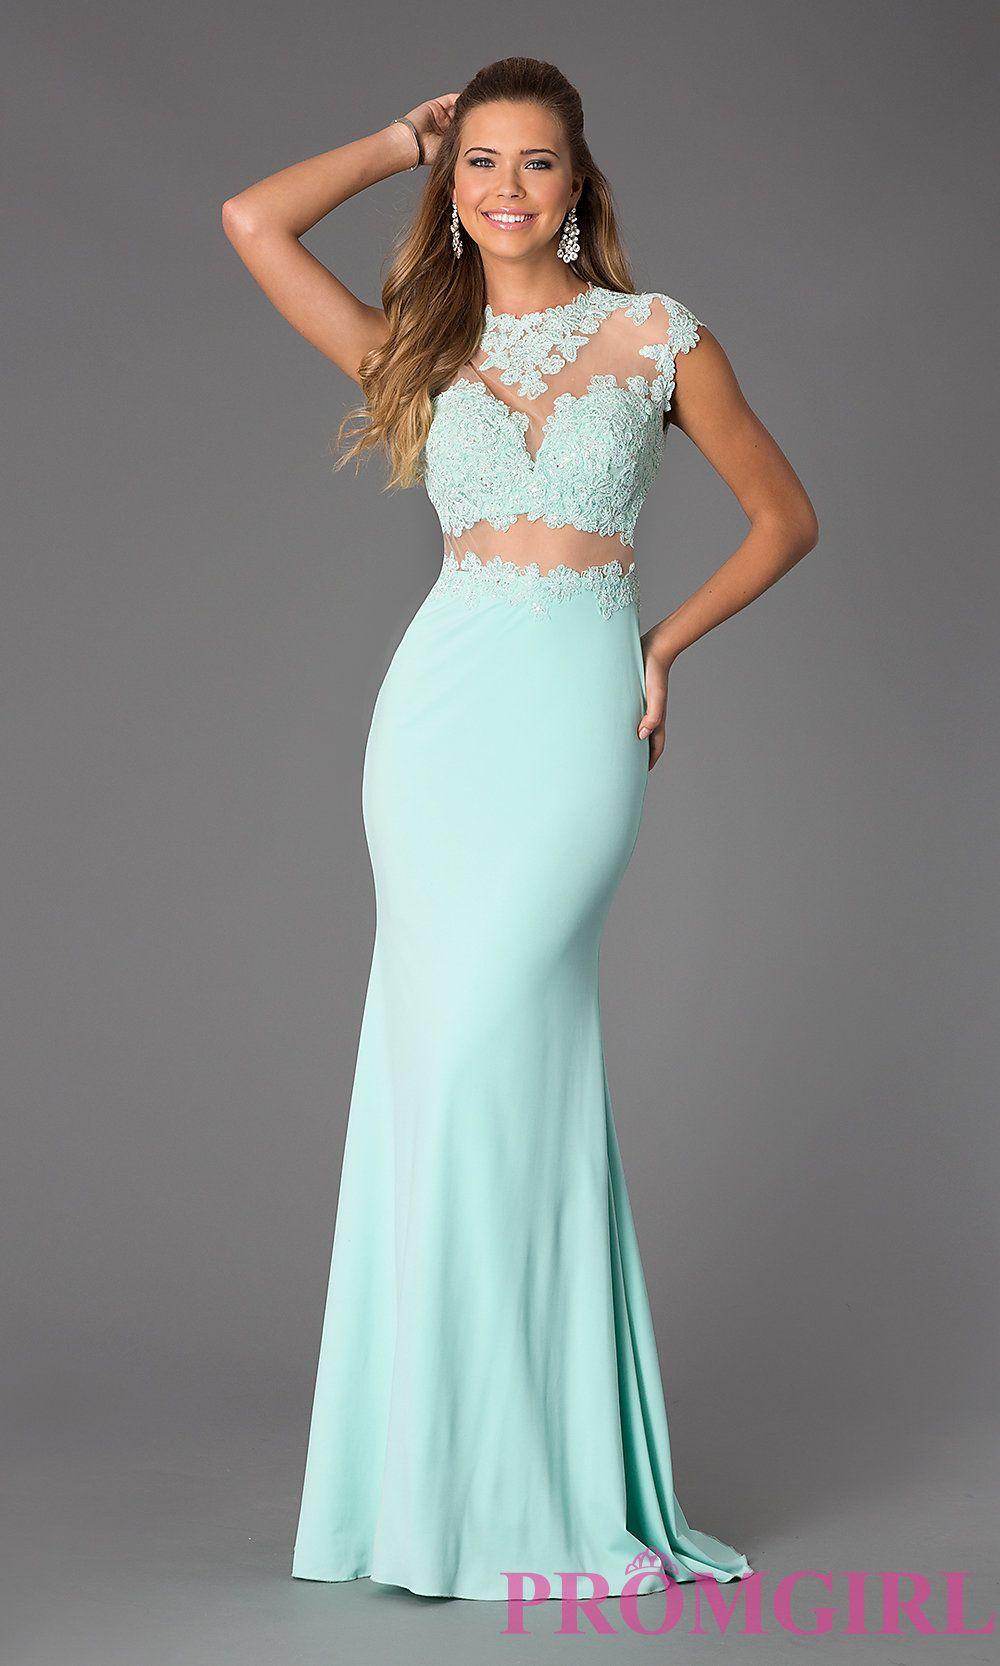 JVN by Jovani Prom Dresses 2015 Jovani Prom Dresses 3914d7495